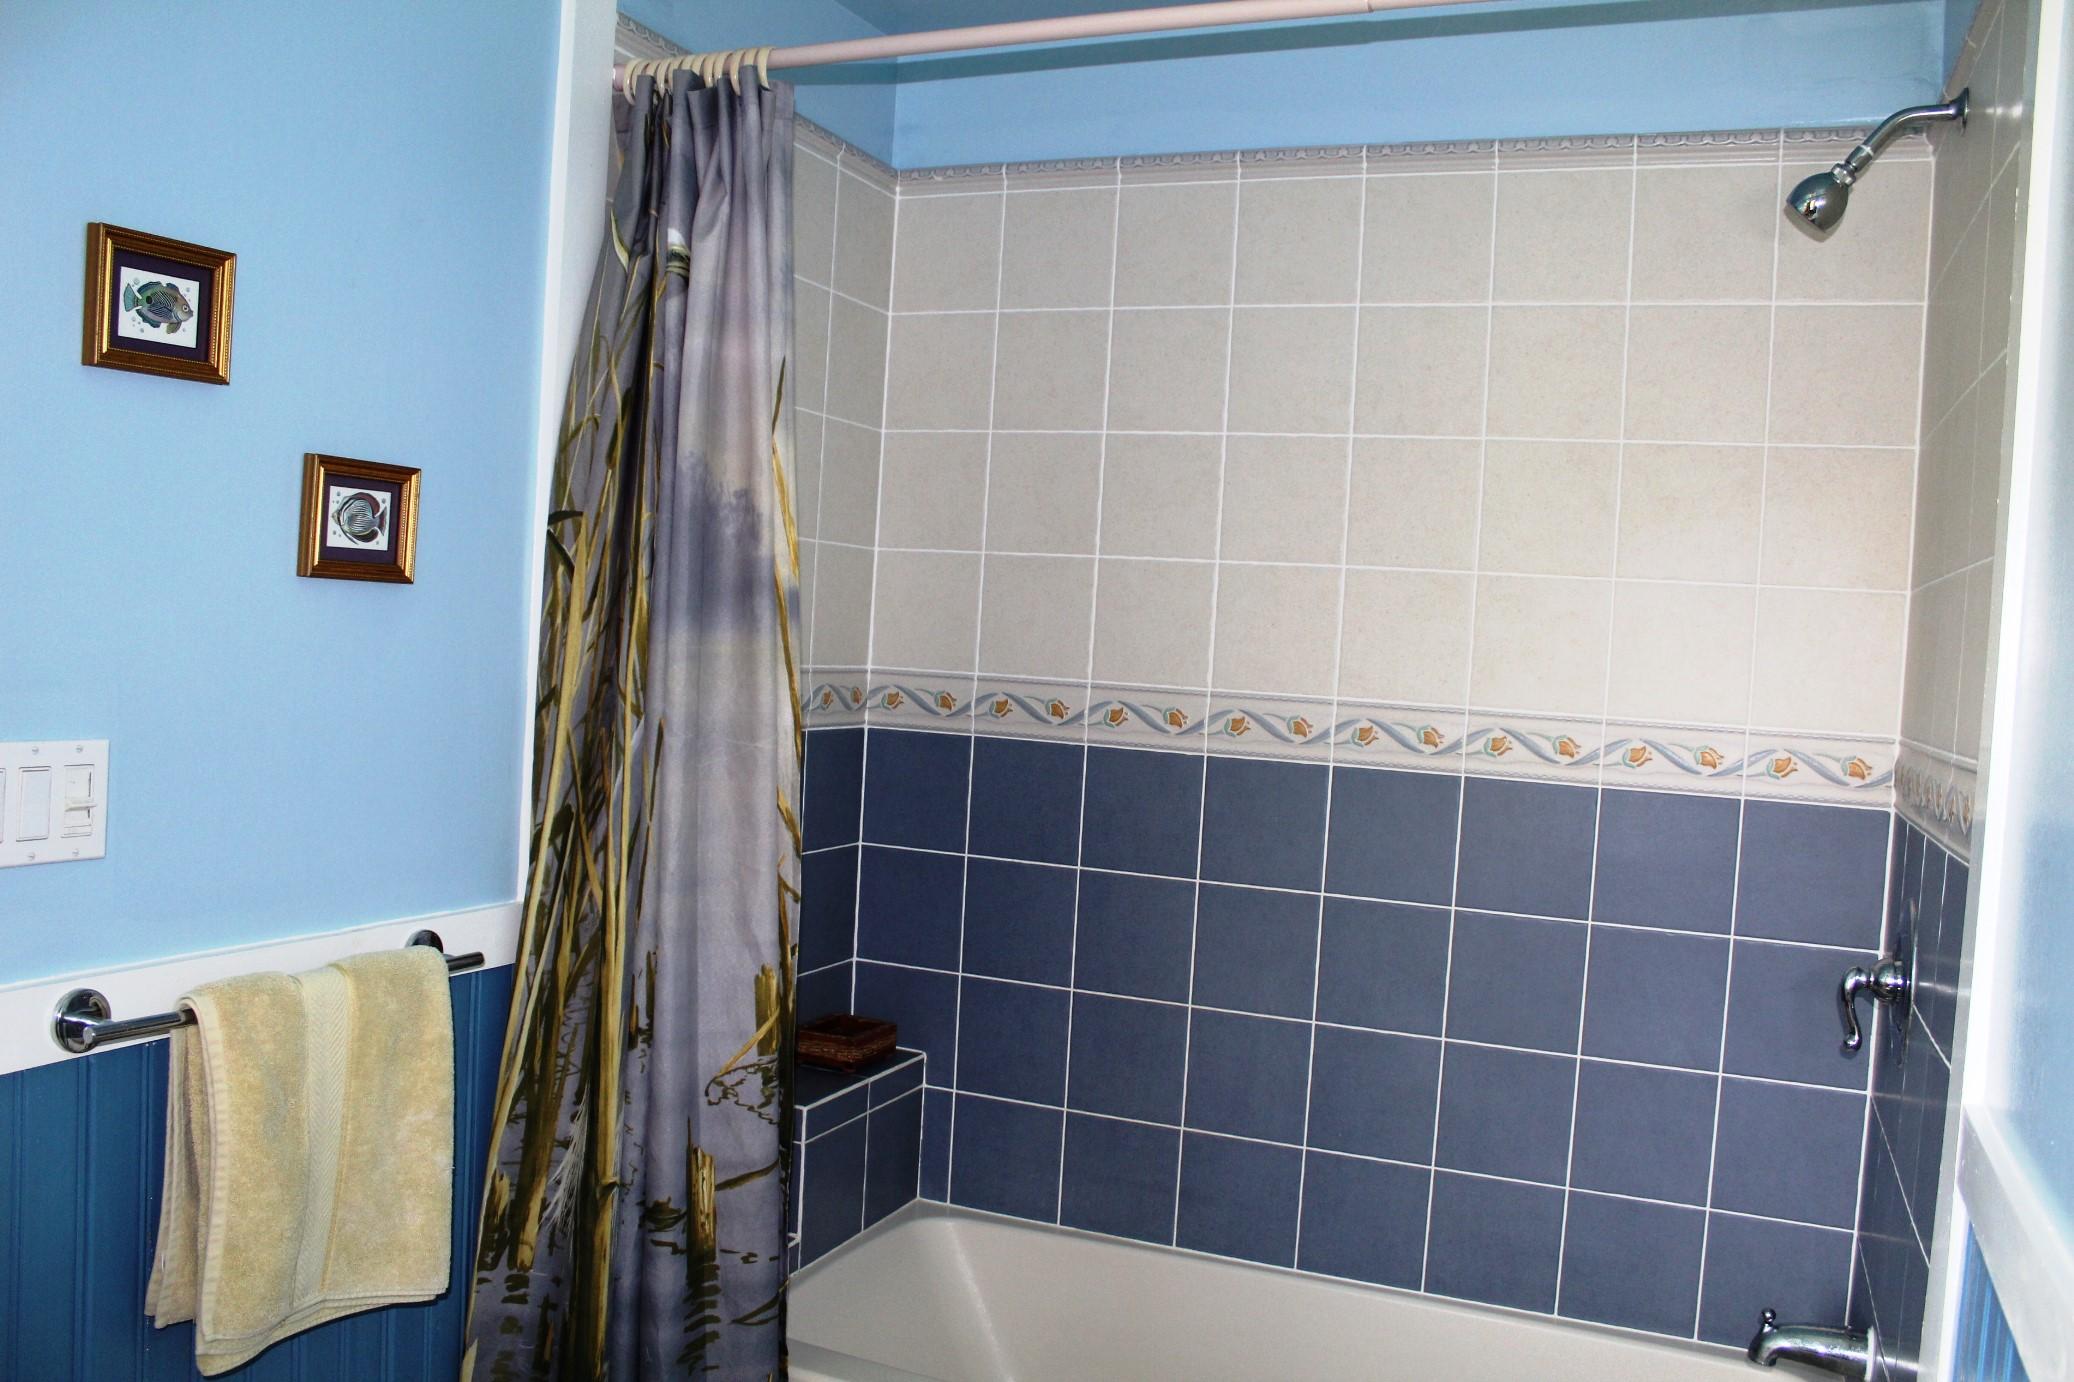 4 bdrm bath